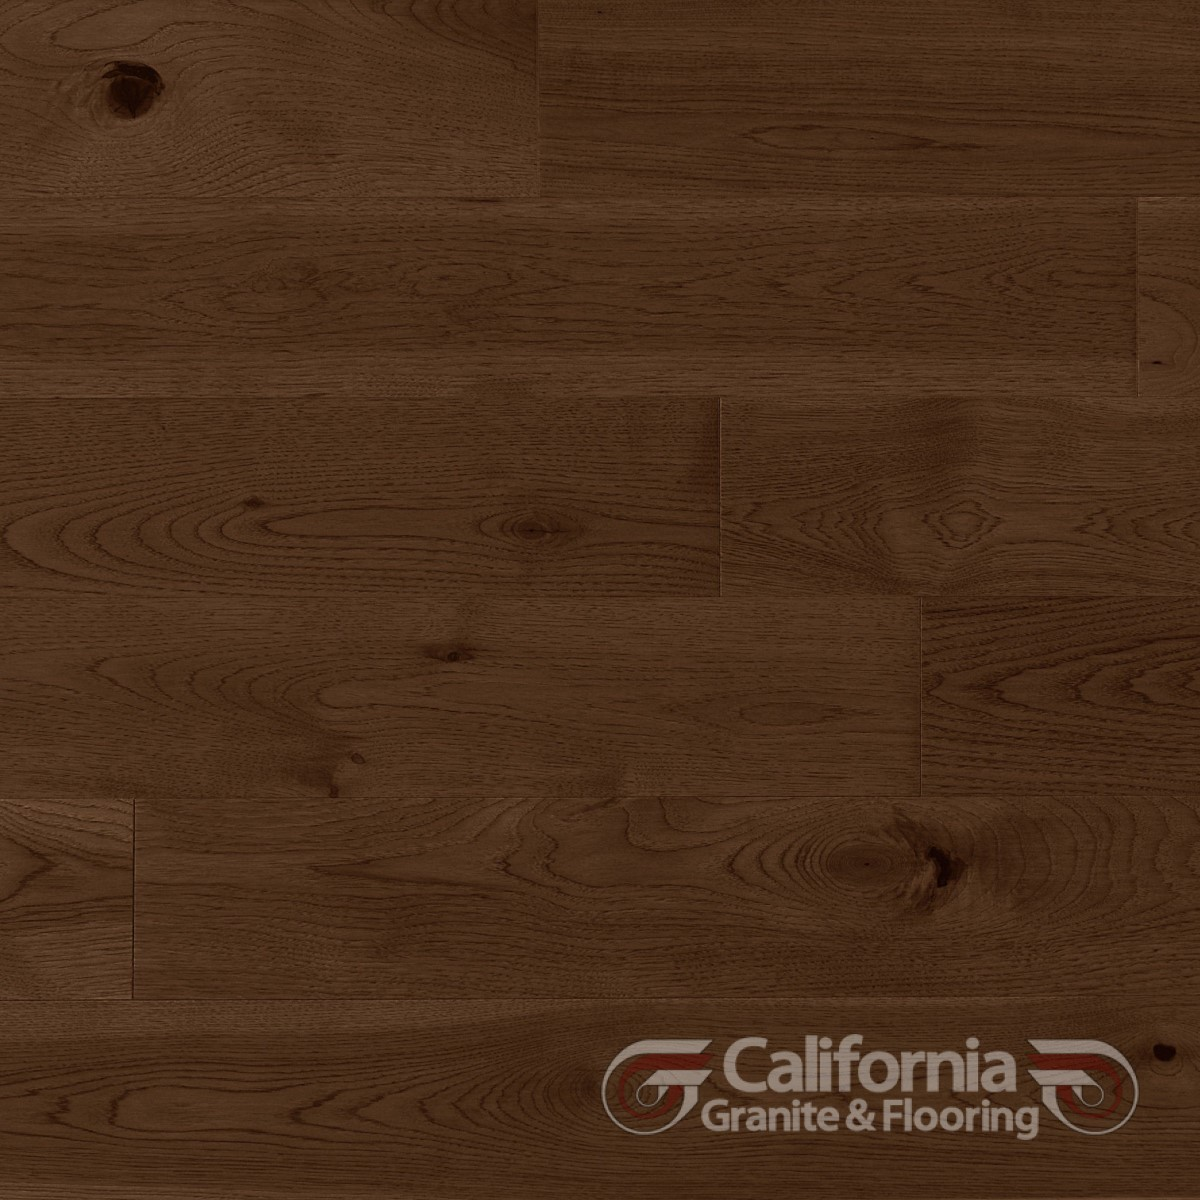 hardwood-flooring-hickory-havana-character-smooth-2